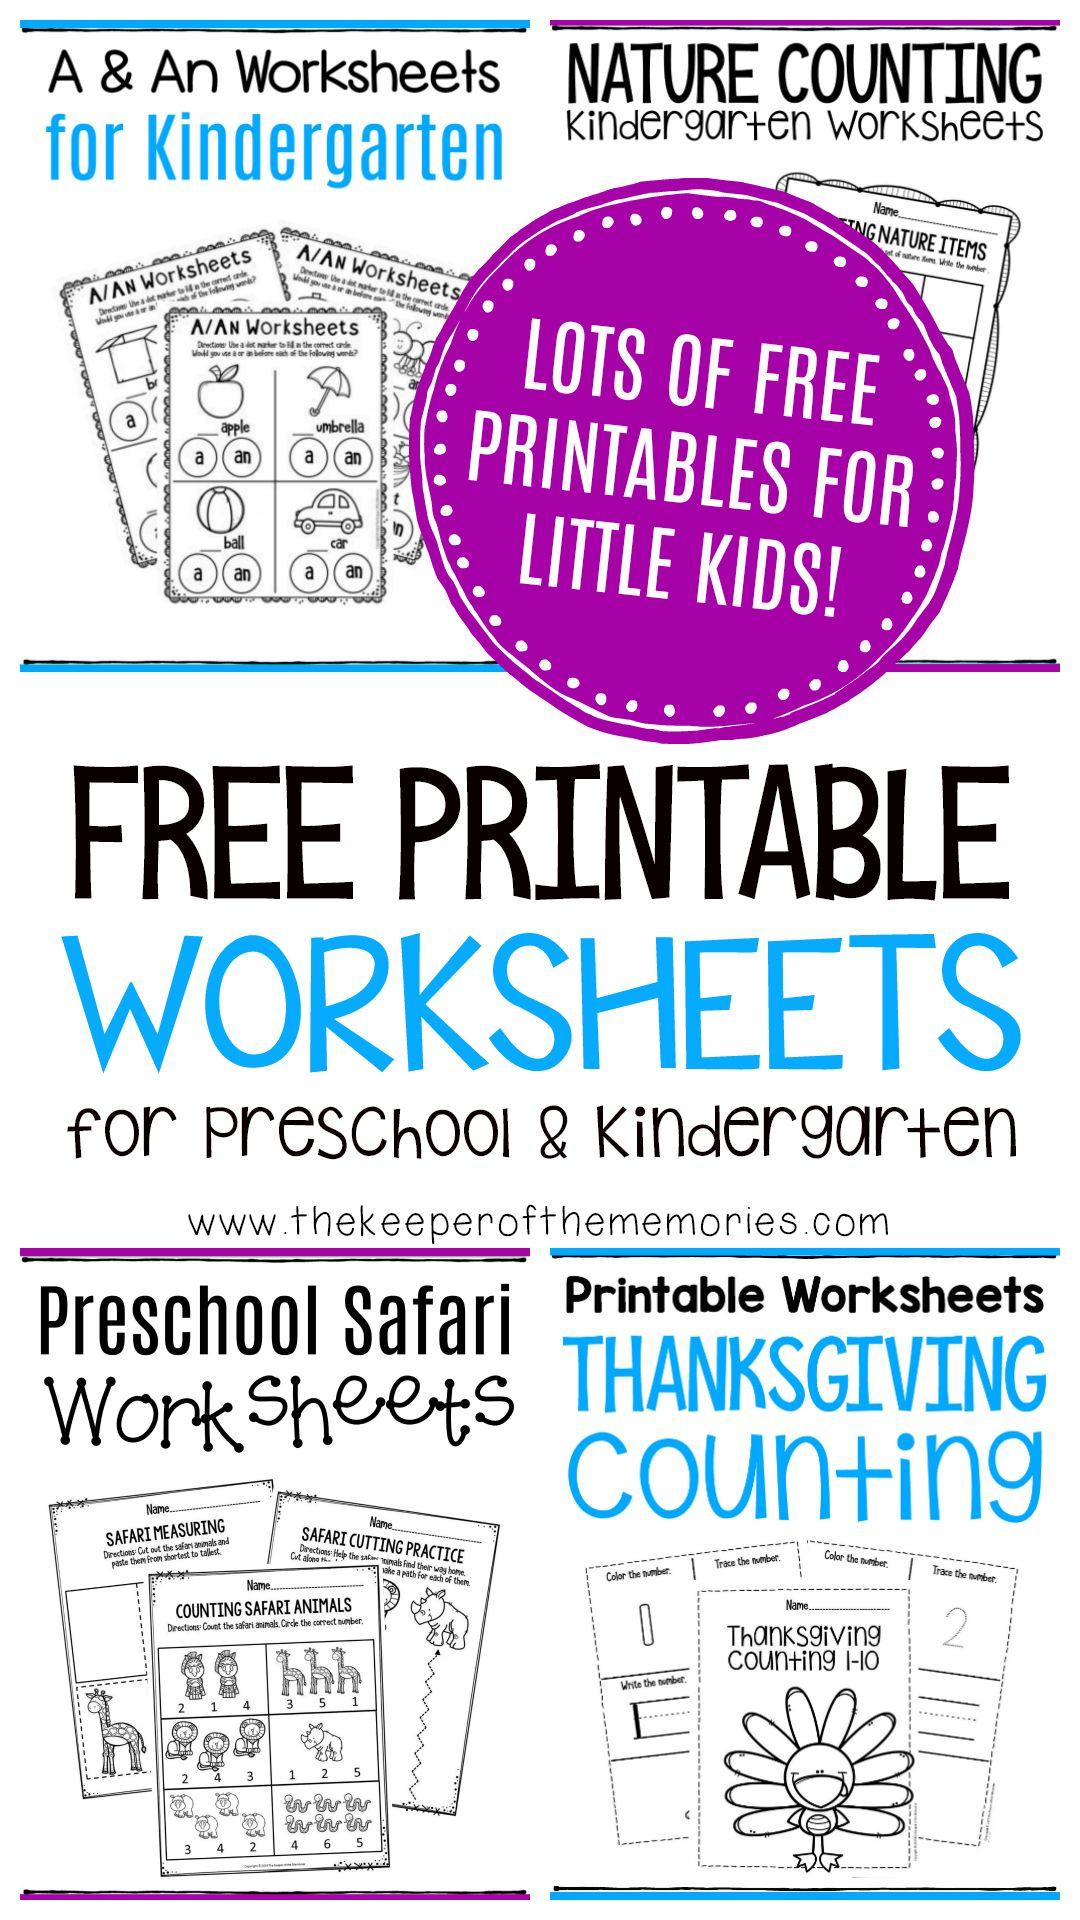 Free Printable Worksheets For Preschool Amp Kindergarten In